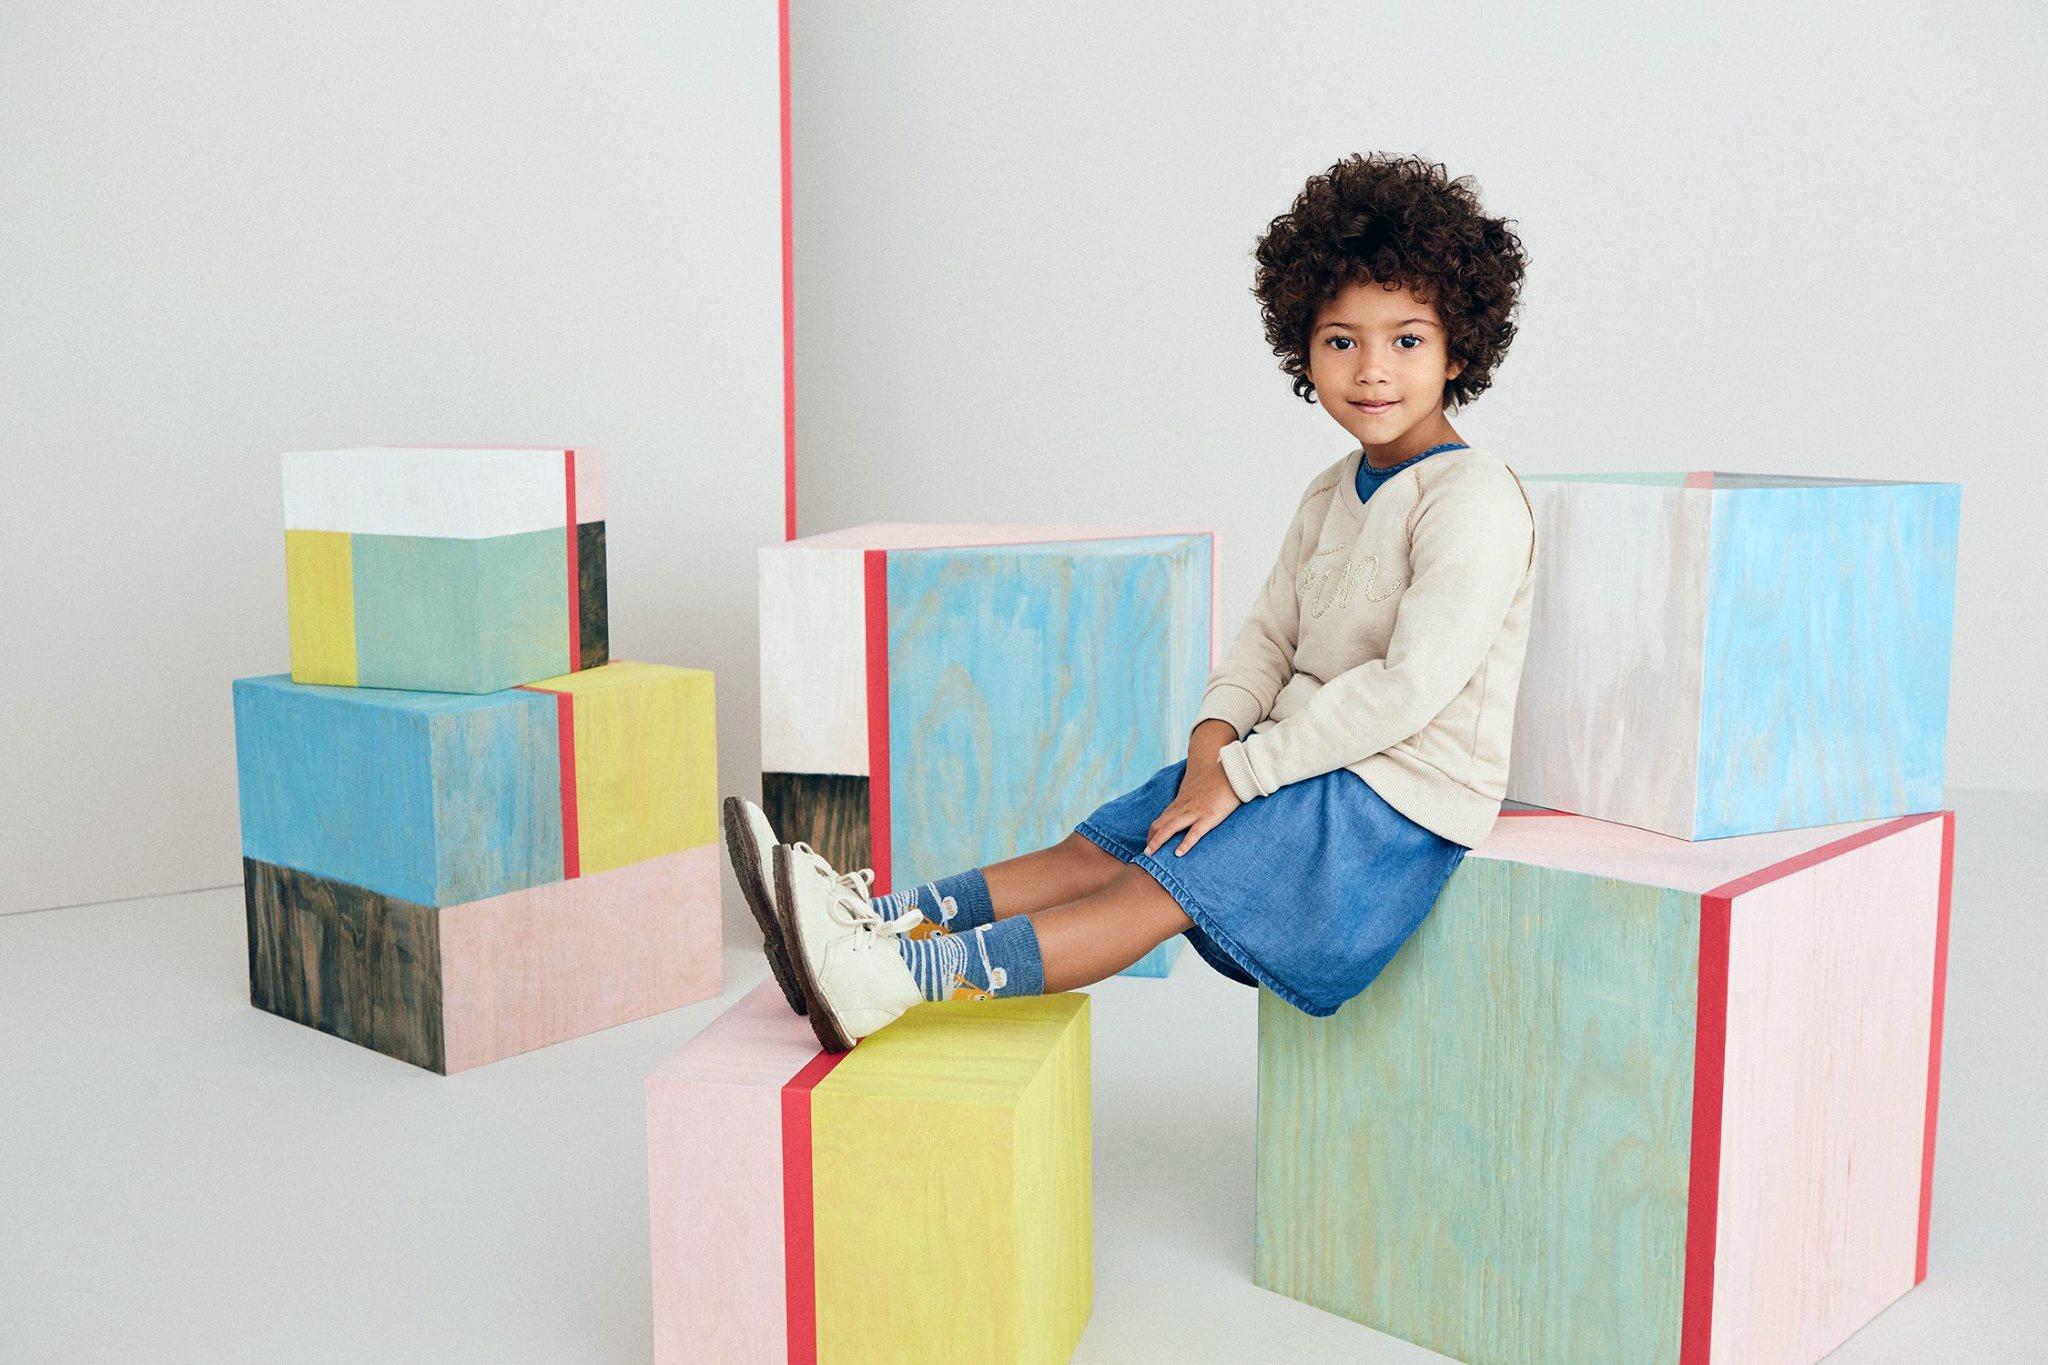 sports-shop-factory-fashion-kid